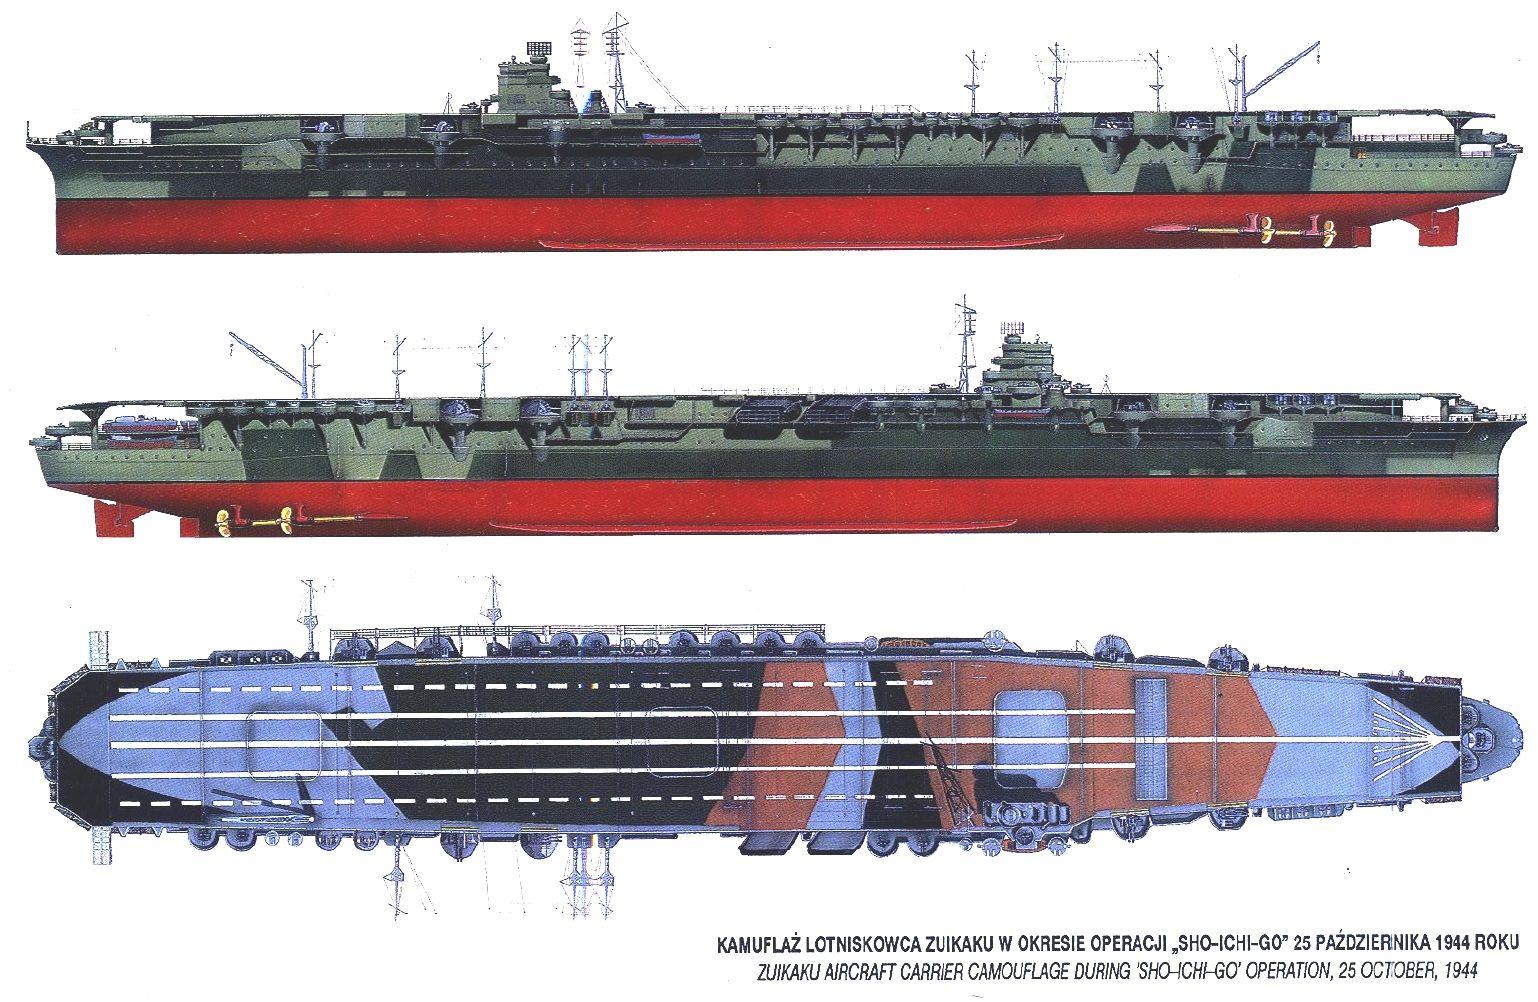 aircraft carrier diagram vdo voltmeter gauge wiring ijn zuikaku warships 70